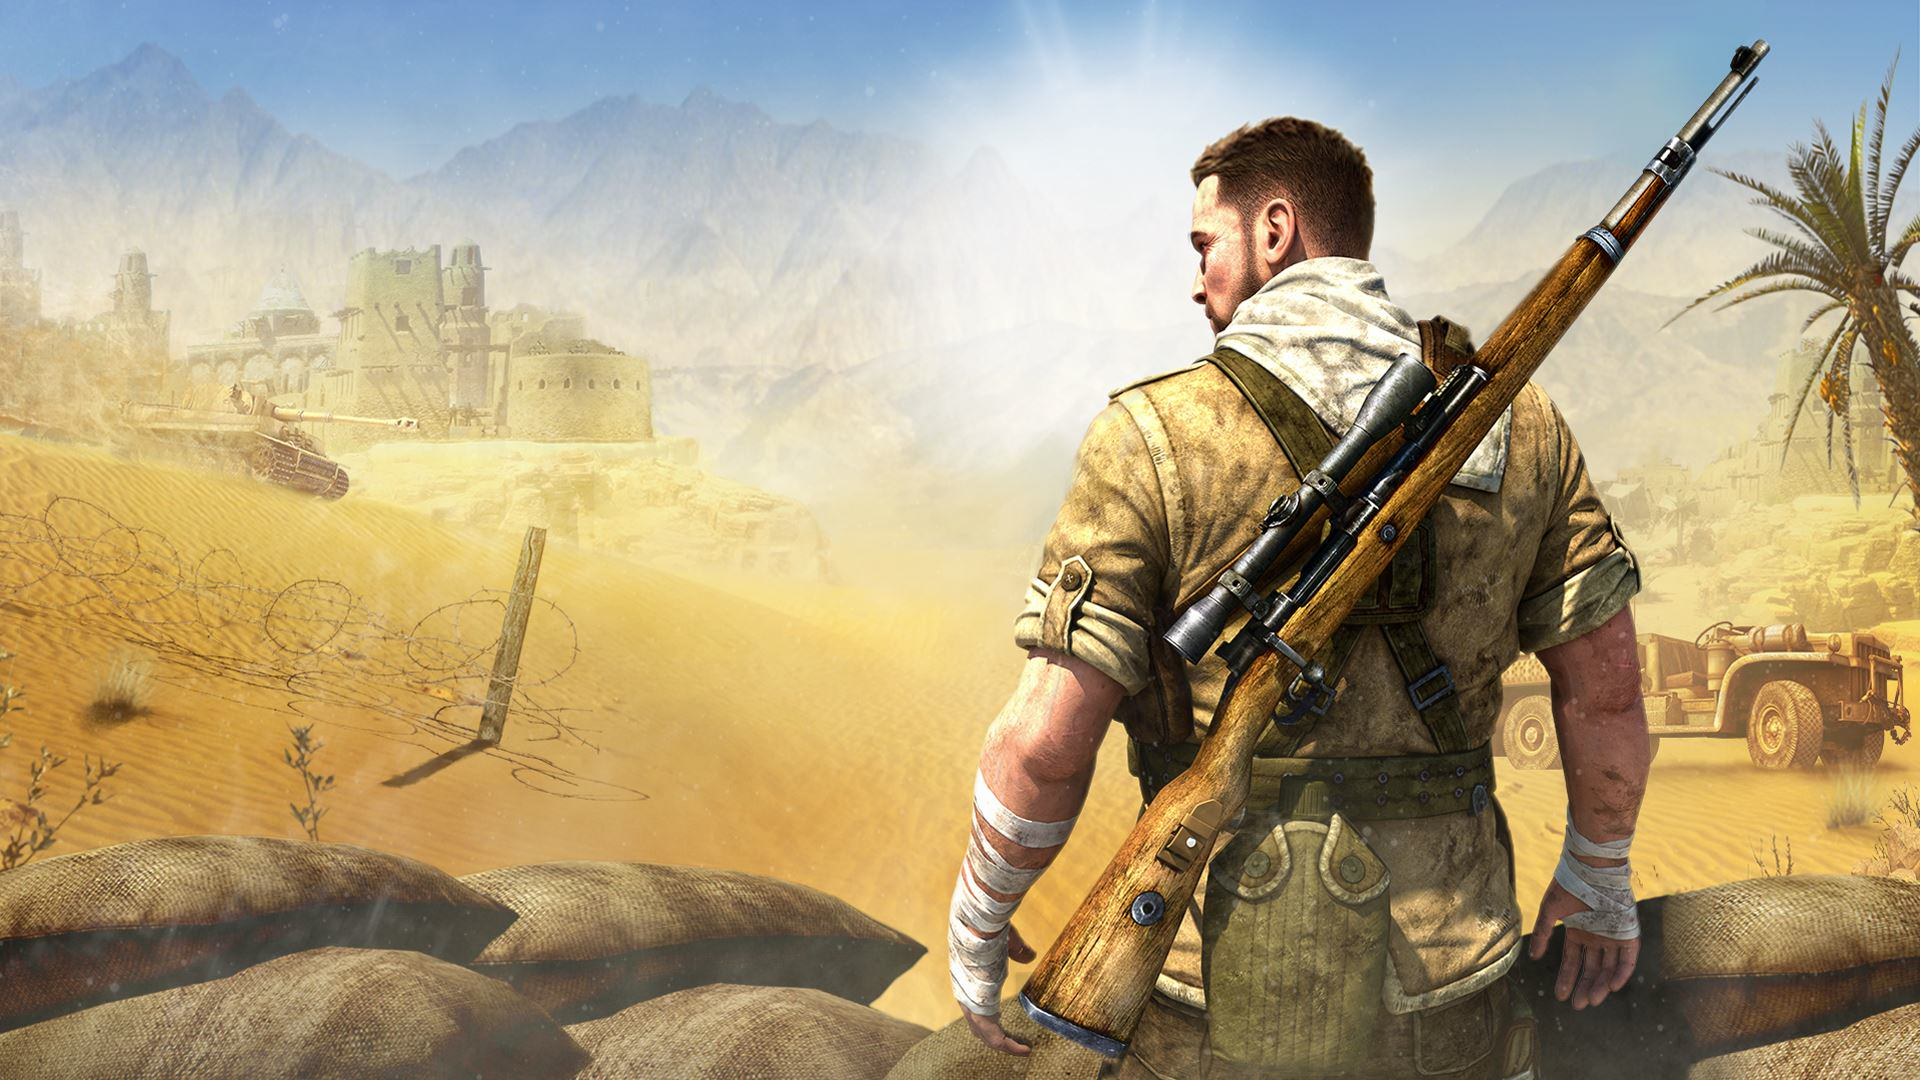 Sniper Elite 3 HD Wallpaper Background Image 1920x1080 ID 1920x1080